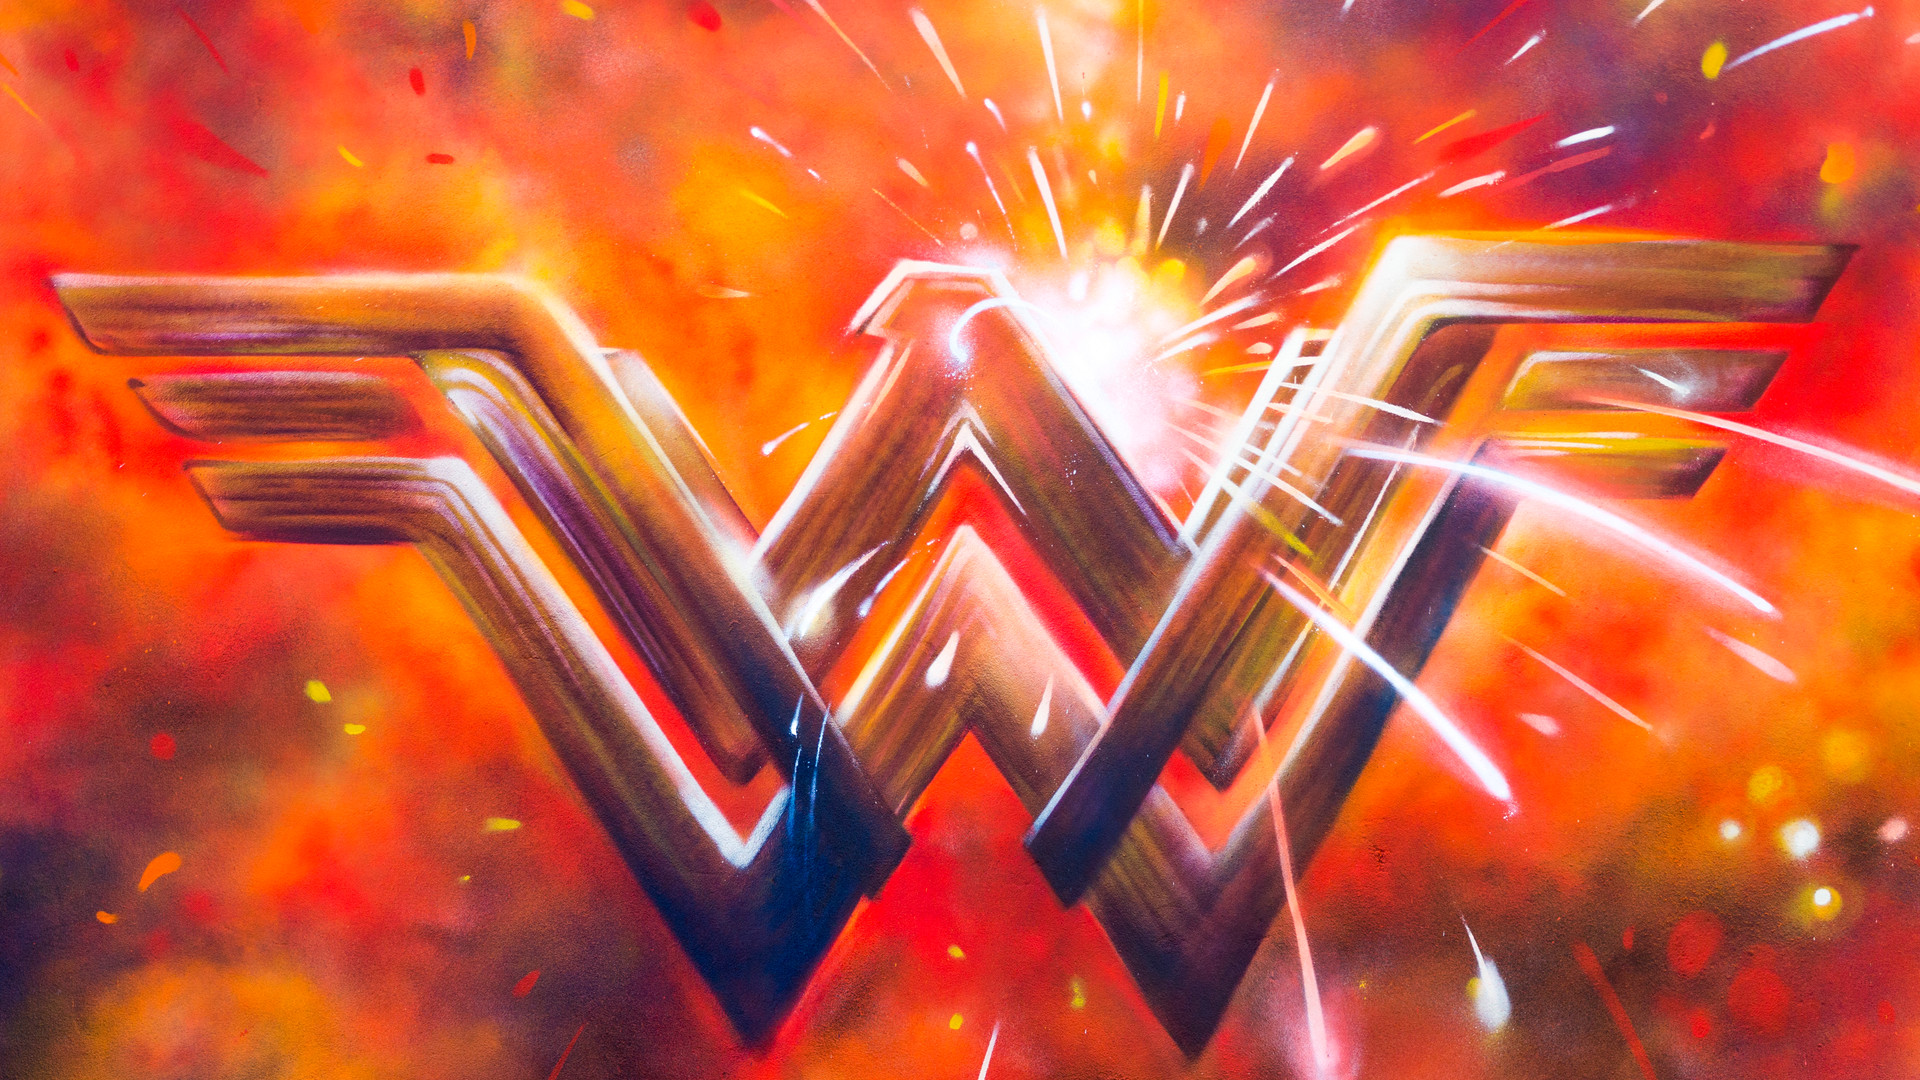 Wonder Woman Joseph Bishop-126.jpg